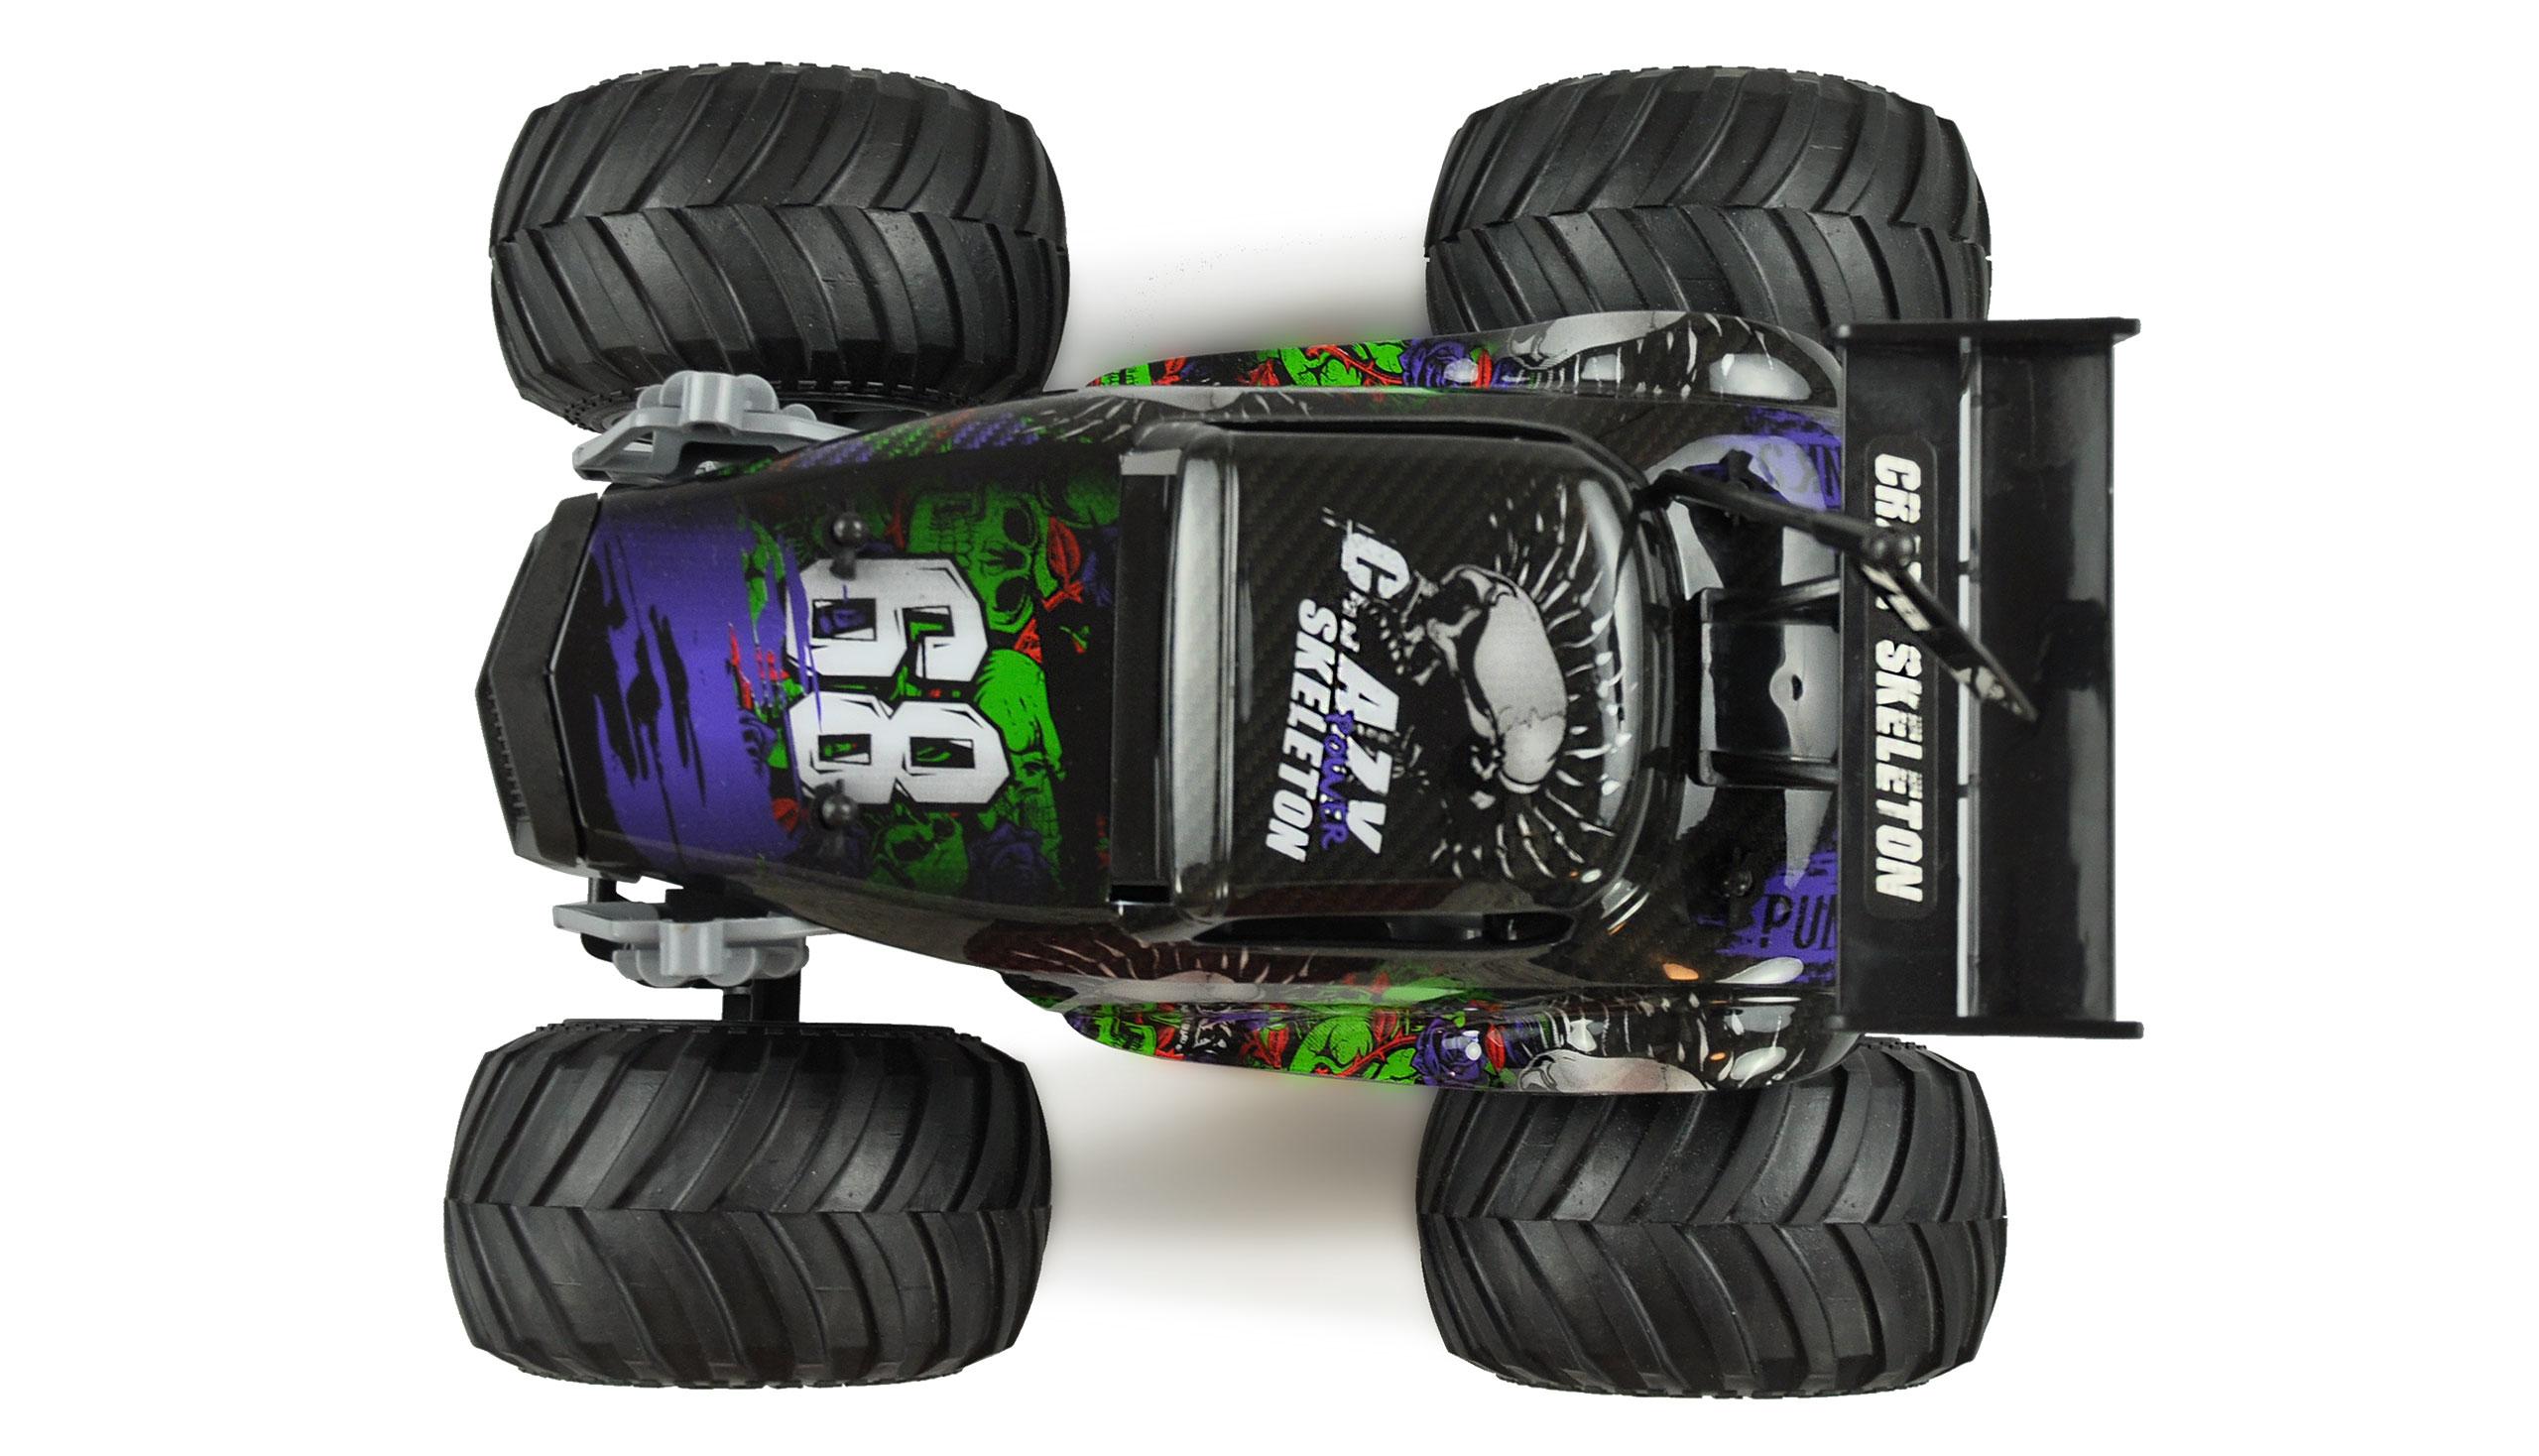 Amewi Crazy Hot Rod - Monstertruck - 1:16 - Junge - 6 Jahr(e) - 700 mAh - 1 kg